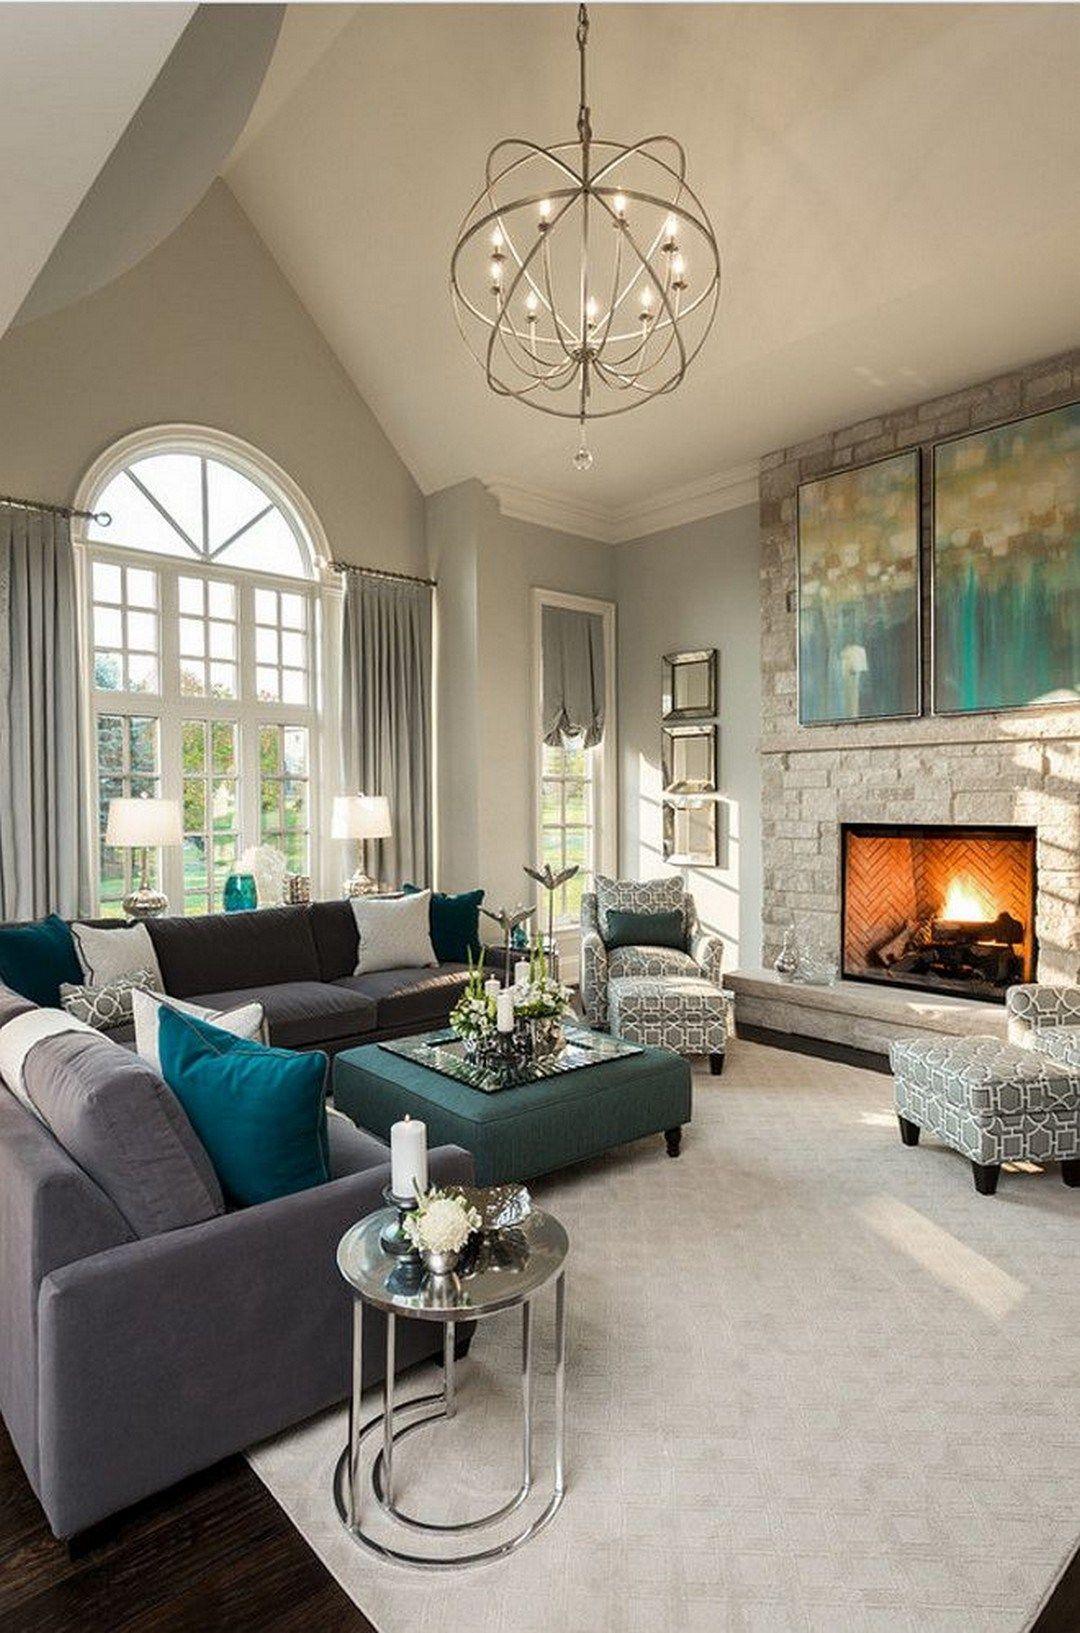 99 Greige Living Room Decor Inspiration (39) | Living room ...